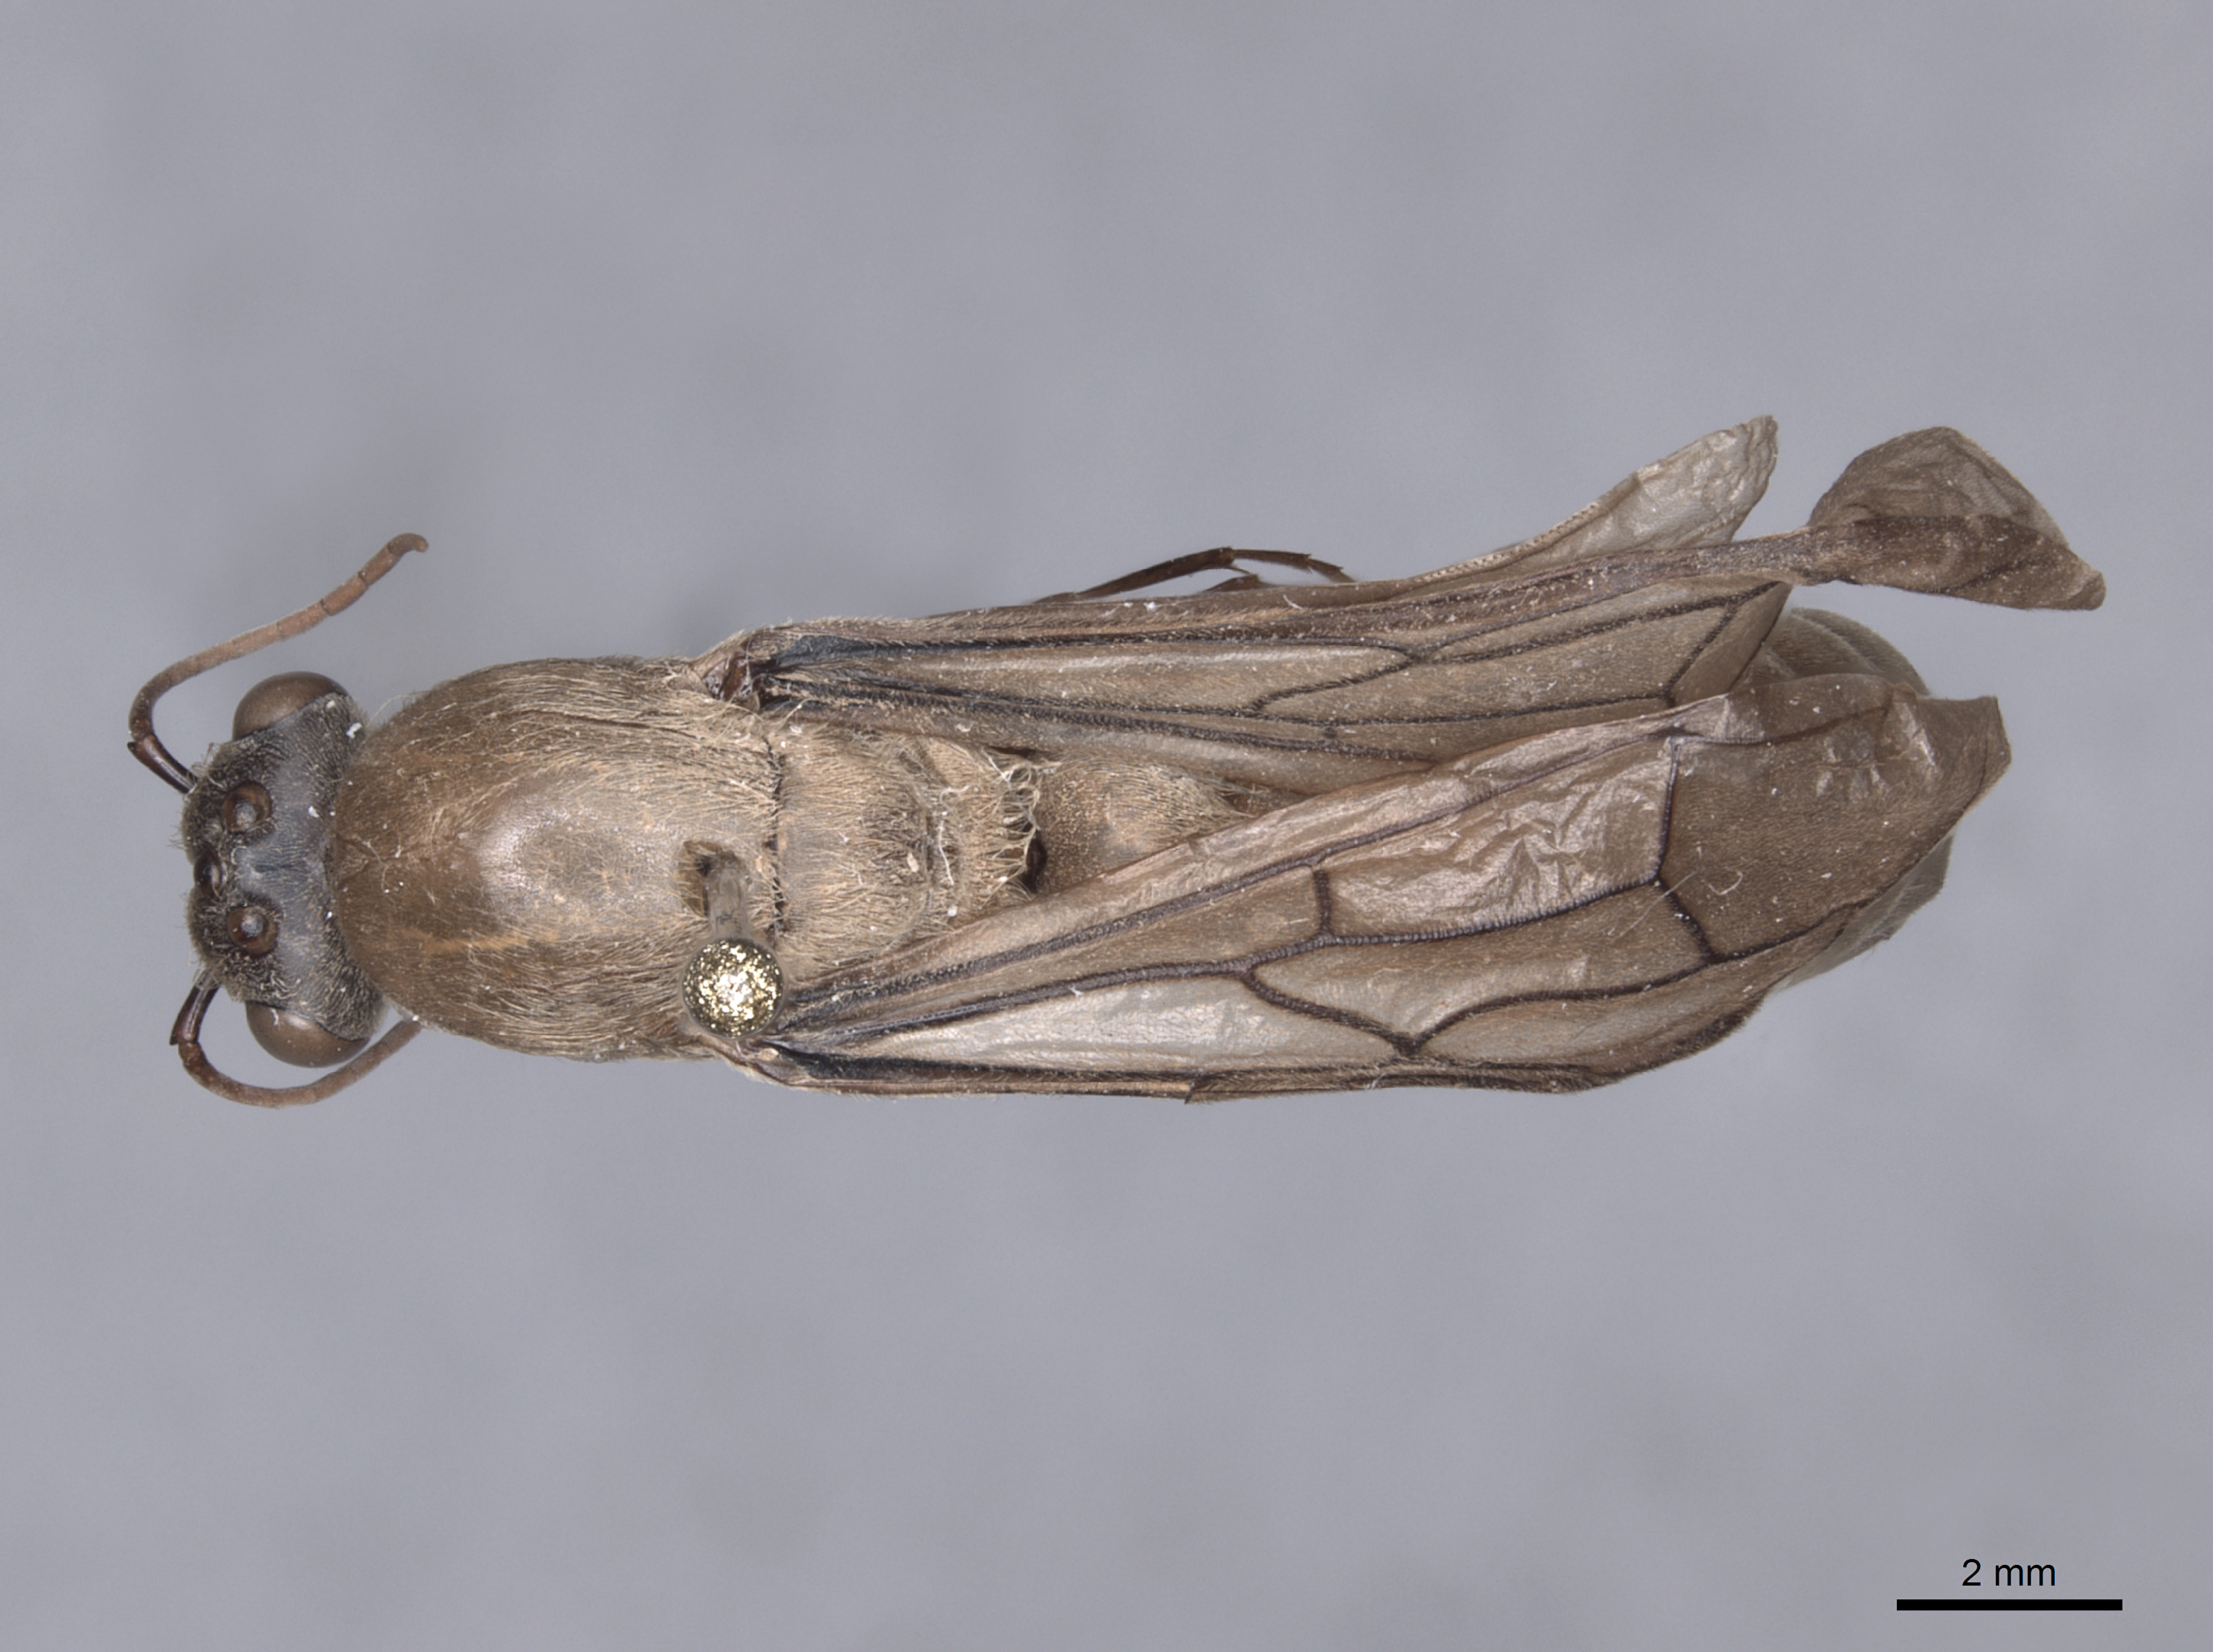 Image of Dorylus orientalis